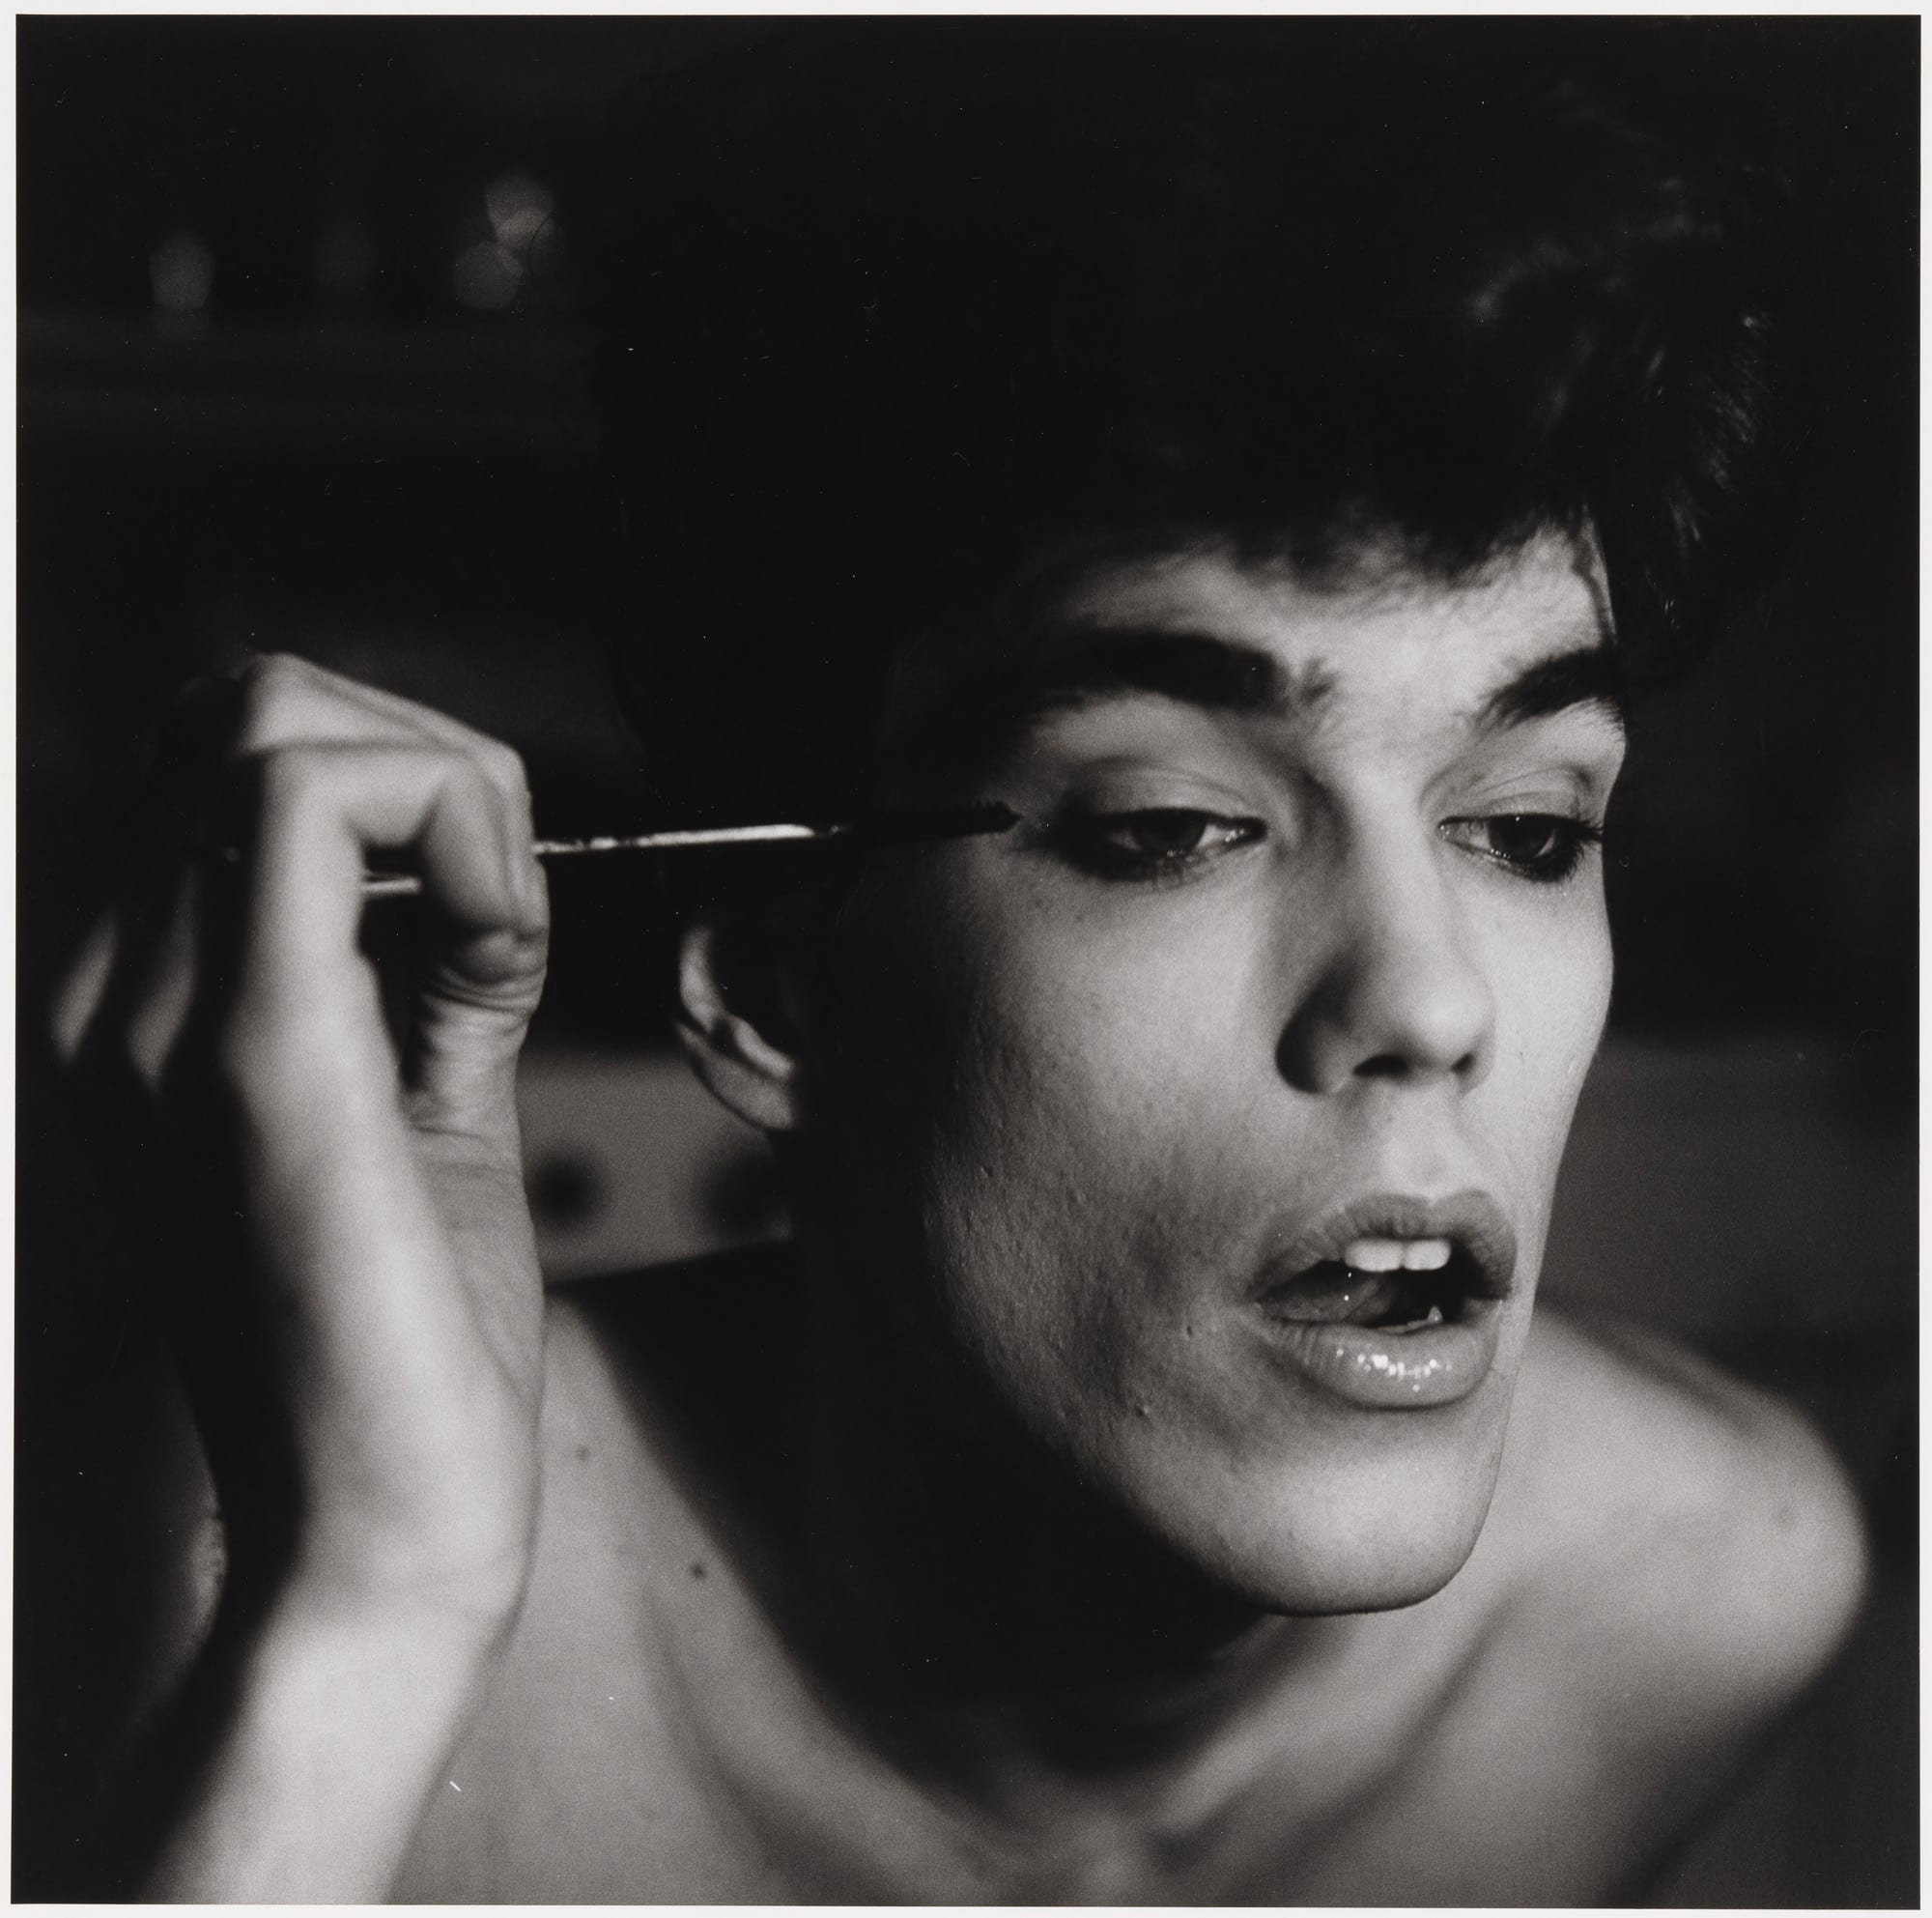 David Brintzenhofe Applying Makeup (II), 1982 © 1987 The Peter Hujar Archive LLC; Courtesy Pace/MacGill Gallery, New York and Fraenkel Gallery, San Francisco